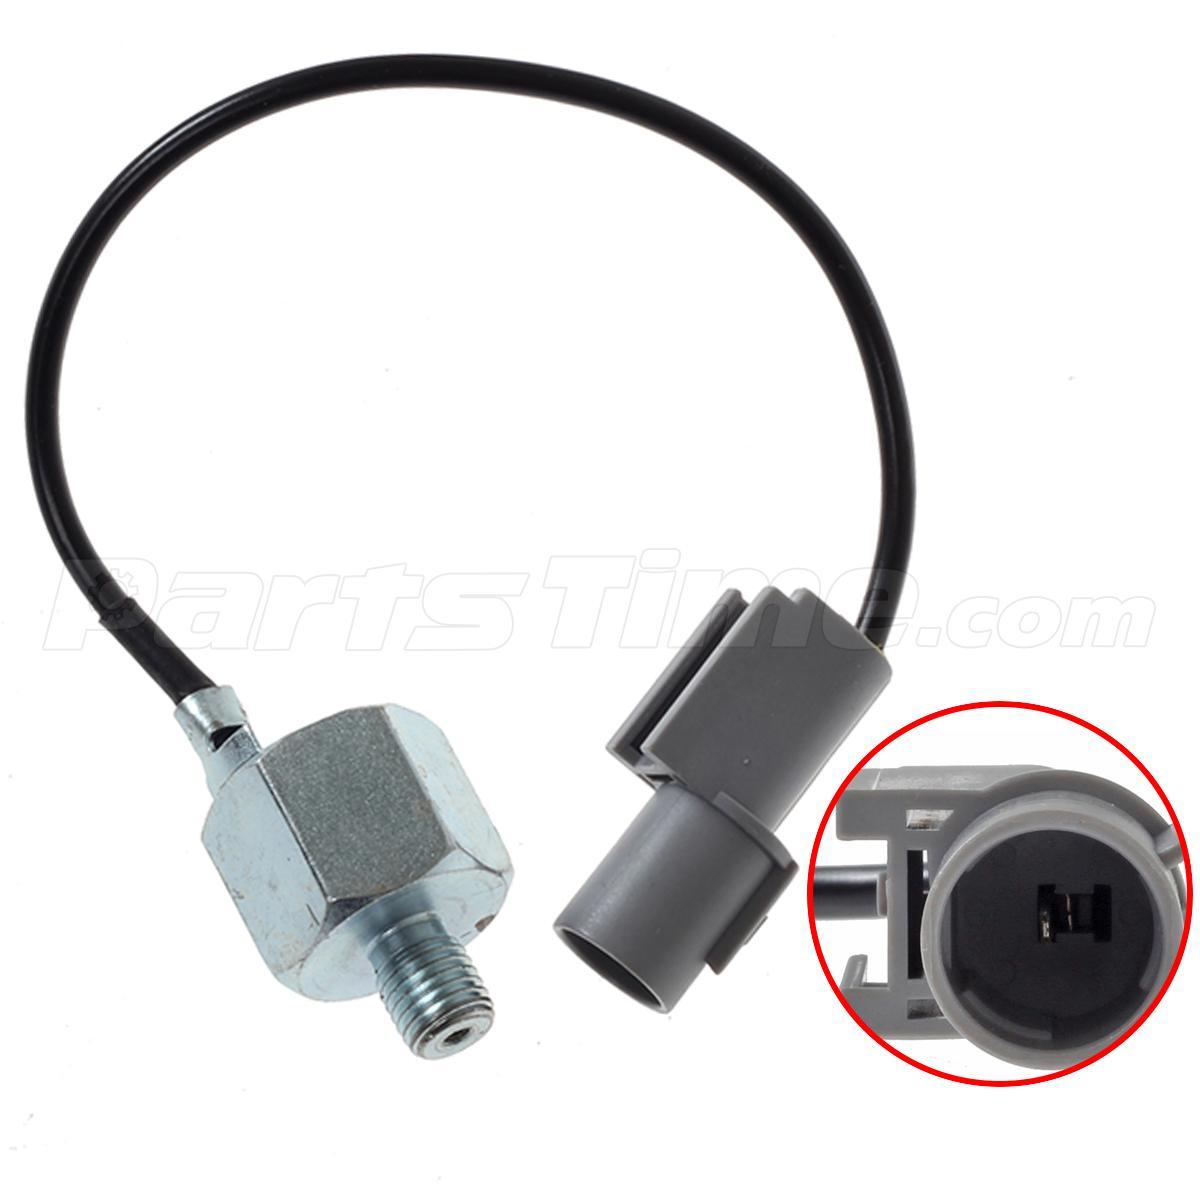 medium resolution of engine knock sensor 1864078g00 for suzuki grand vitara ford f 250 fog light wiring harness